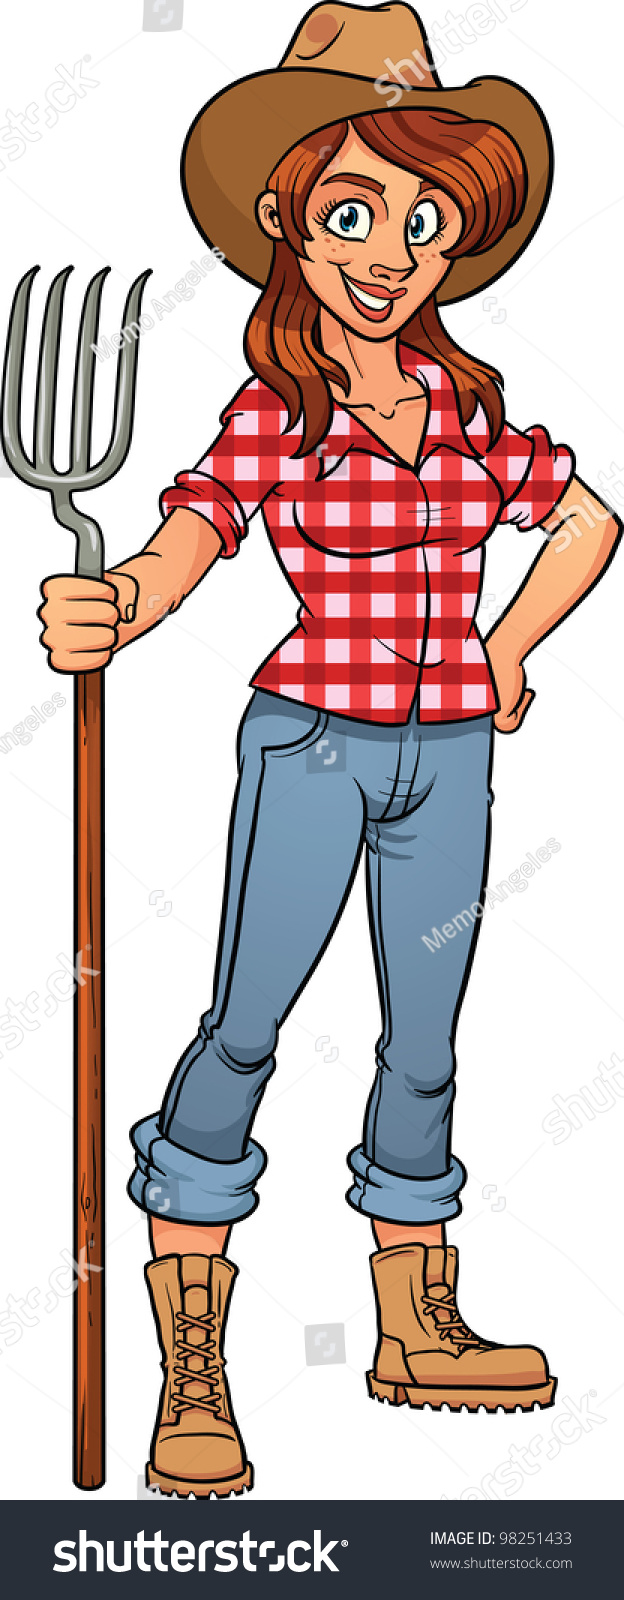 farmer single women No1 popular farmer dating site mingle with 1000s of single farmers seeking friendship, love, & more find rural romance online today.